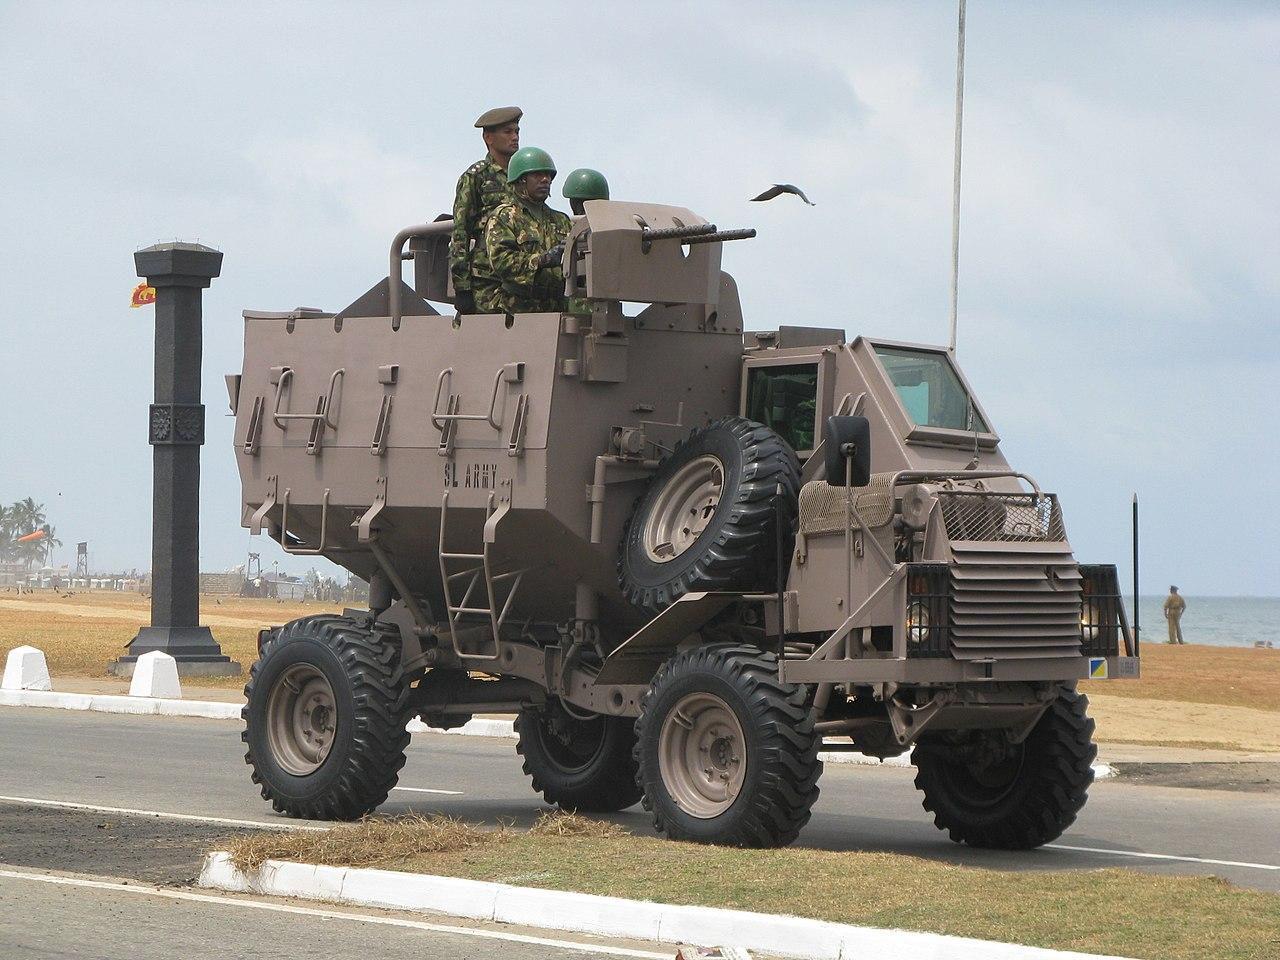 1280px-Sri_Lanka_Military_0196.jpg